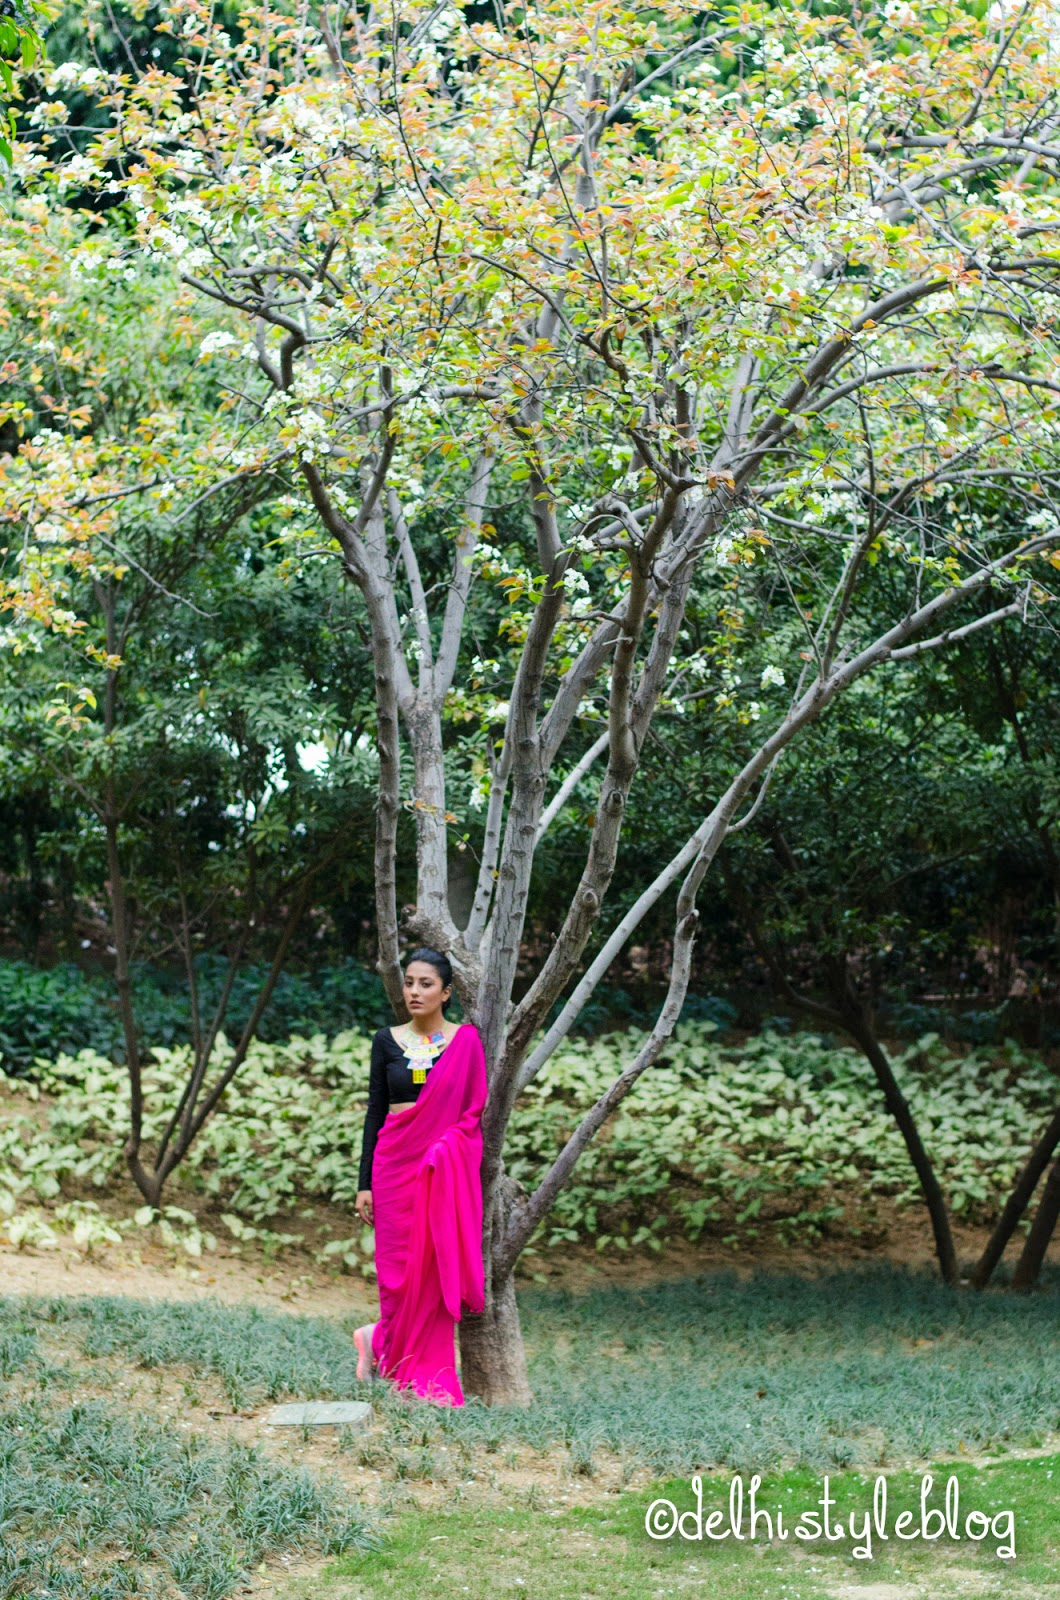 Peach tree Blossom at Dusit Devrana